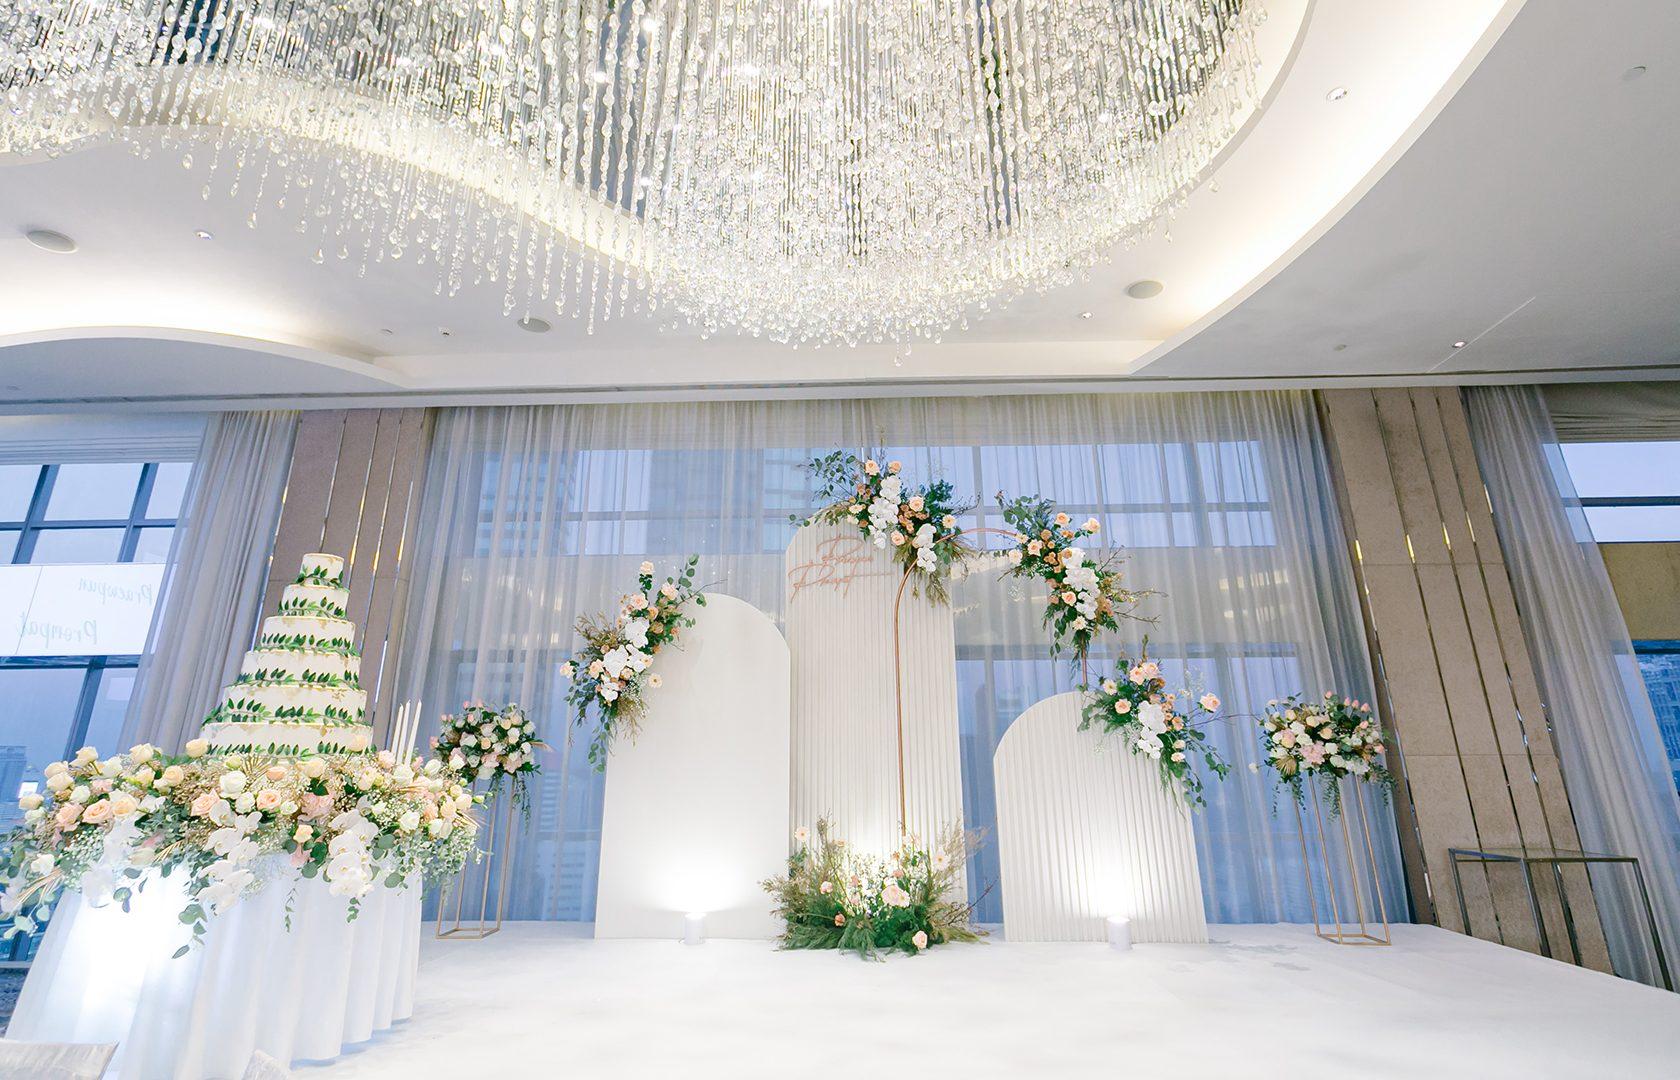 top floor Ballroom elegant wedding decoration